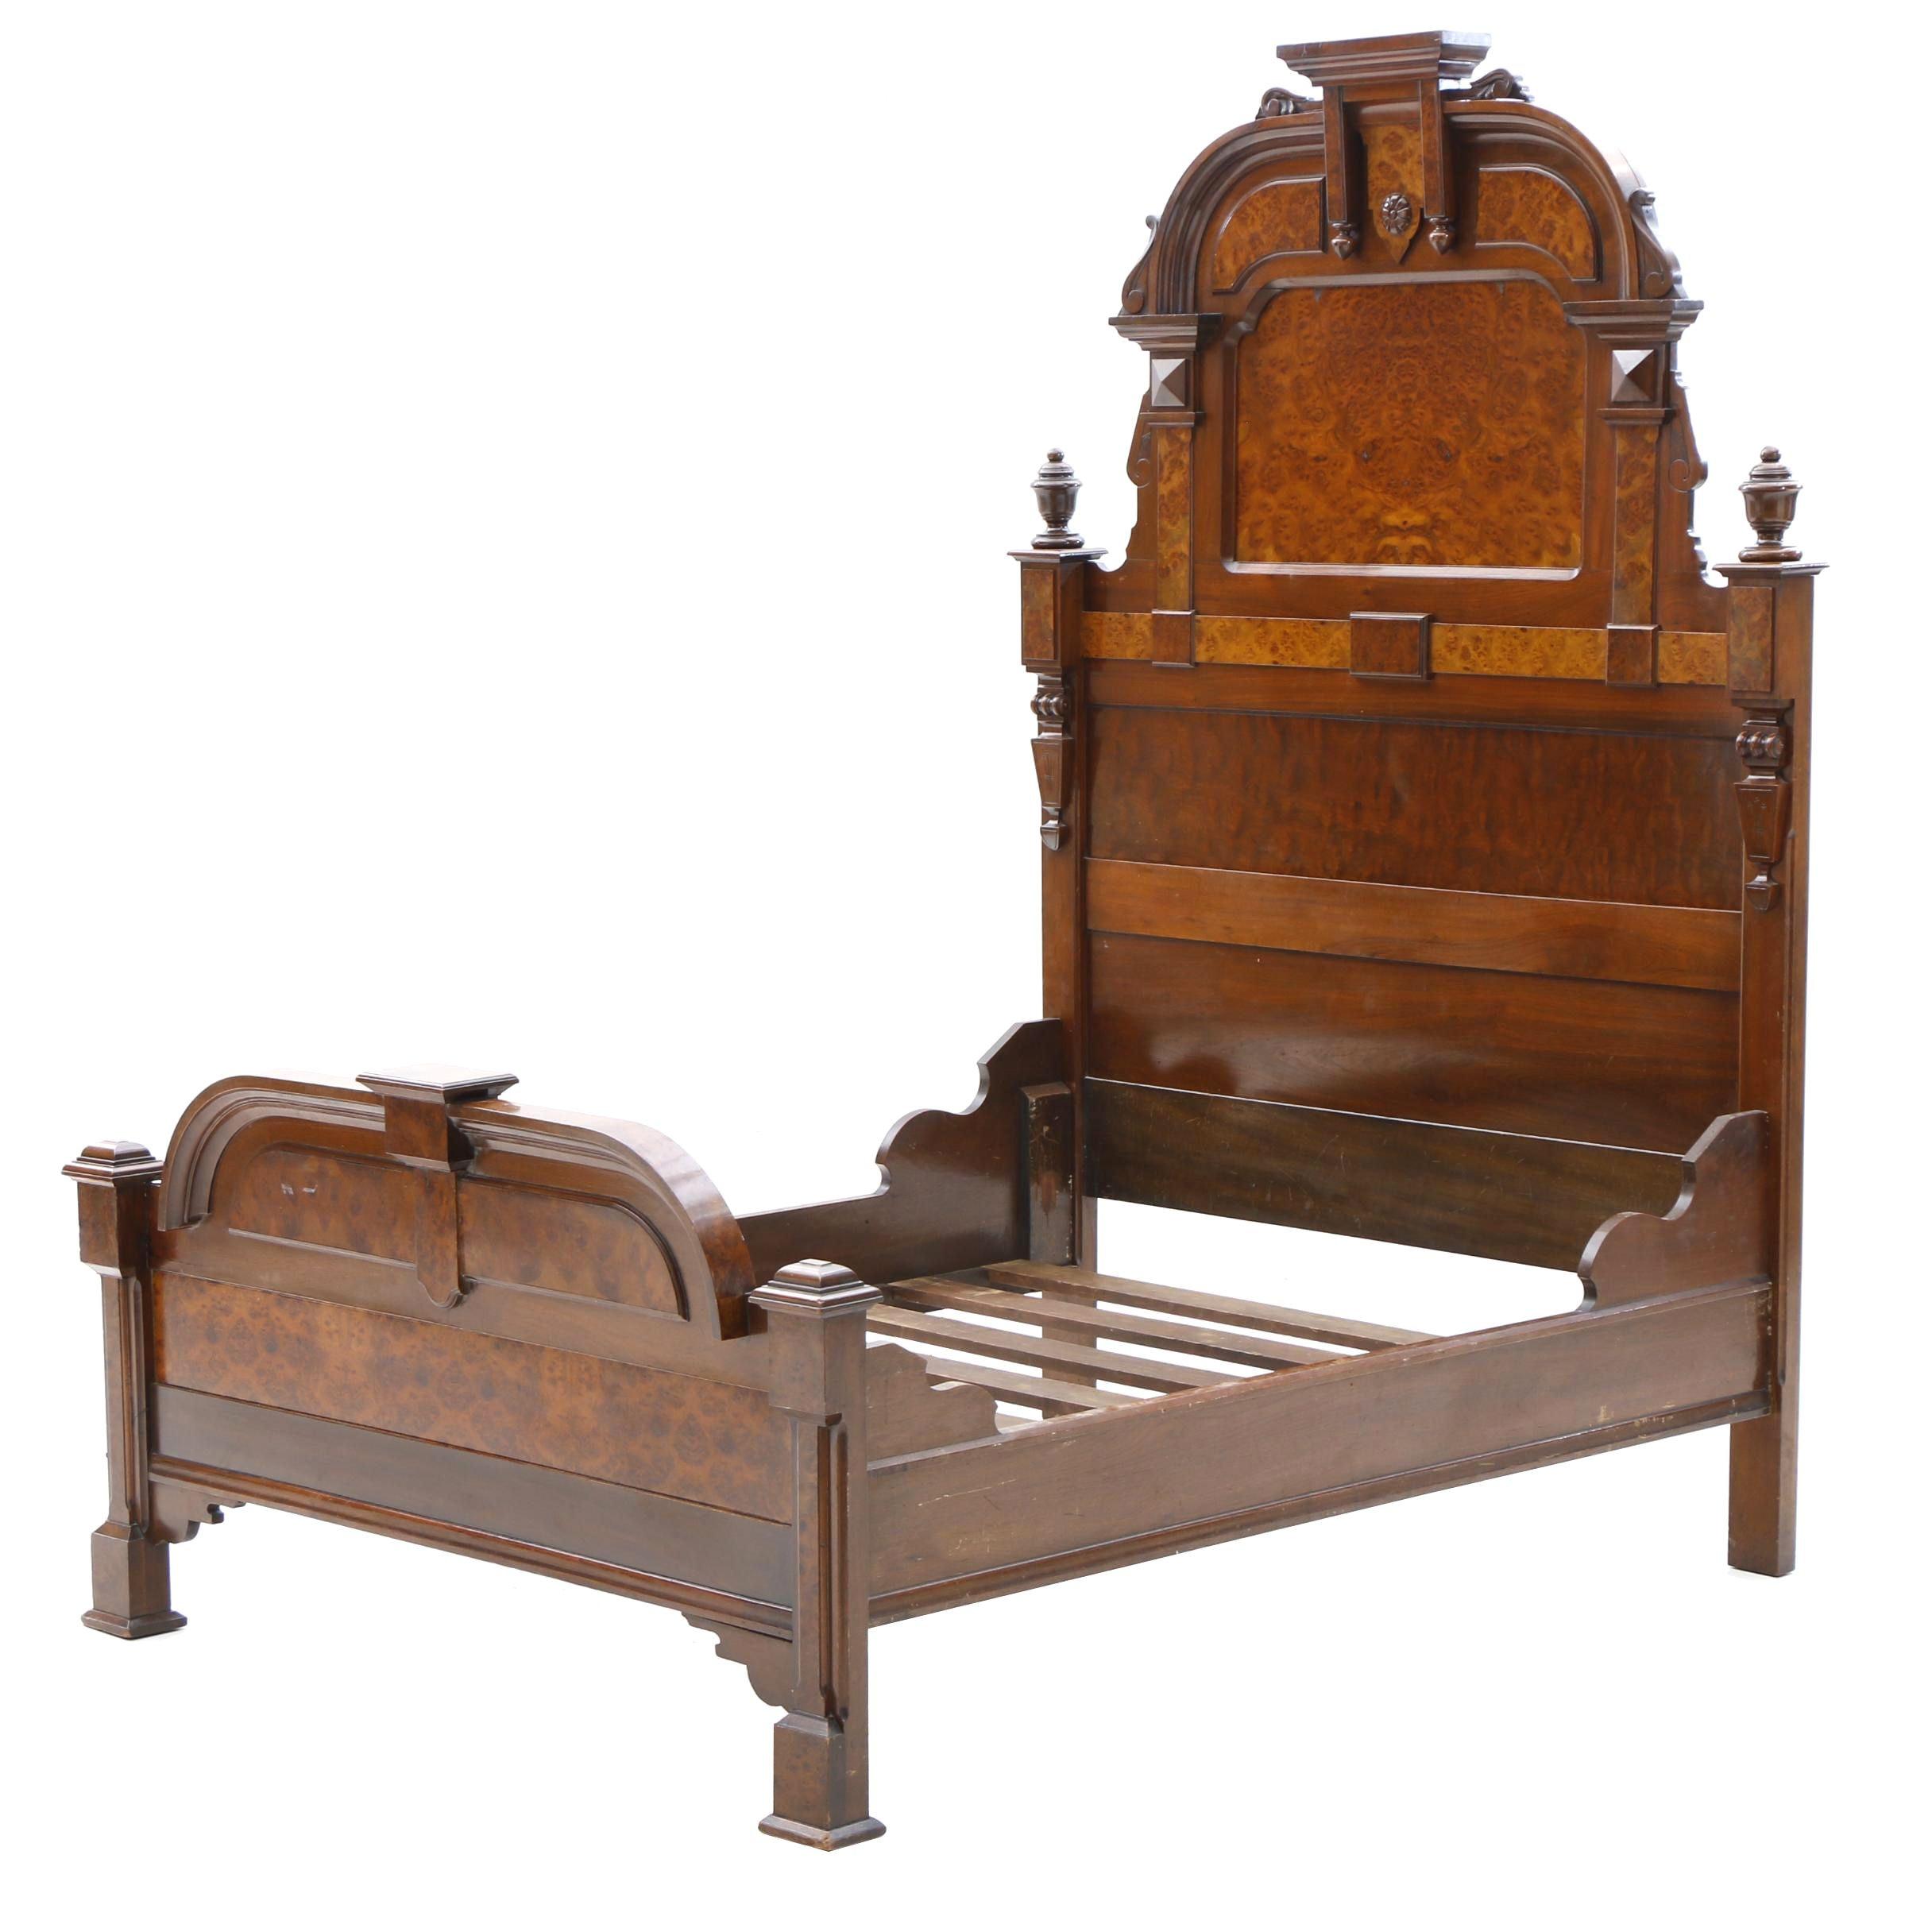 Victorian Walnut Full Size Bed Frame, Circa 1870